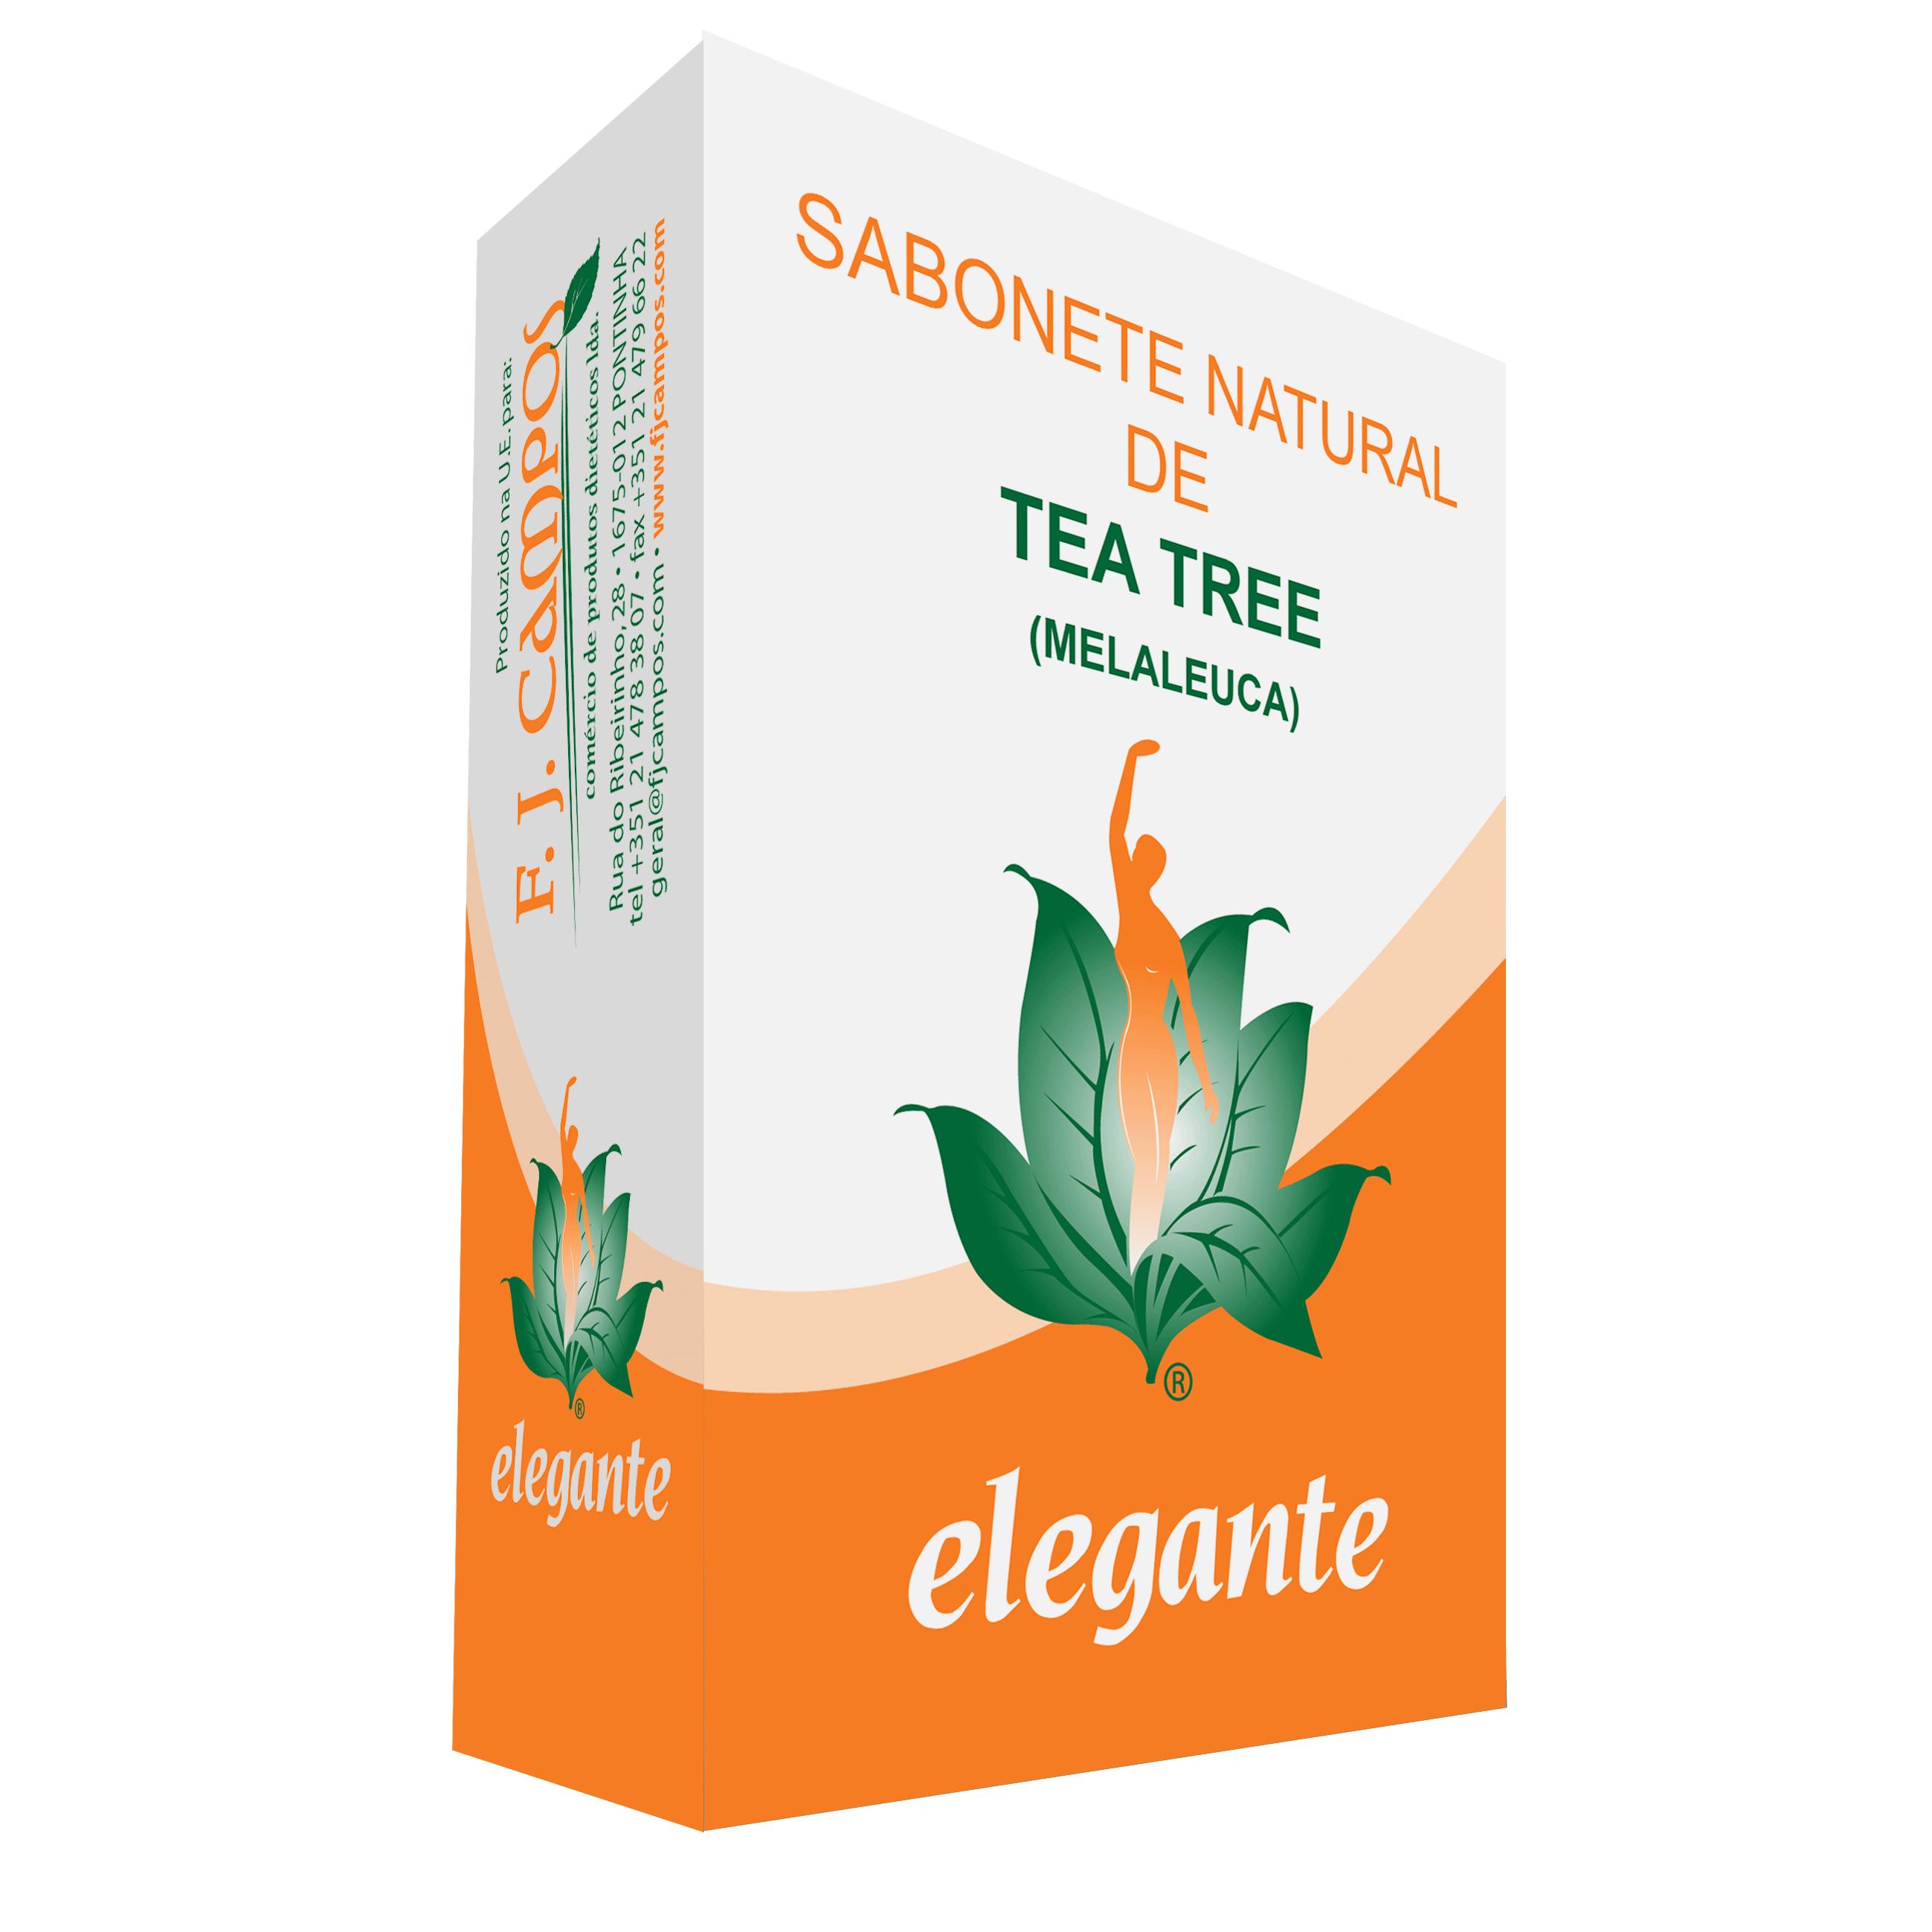 Sabonete Tea Tree (Melaleuca)